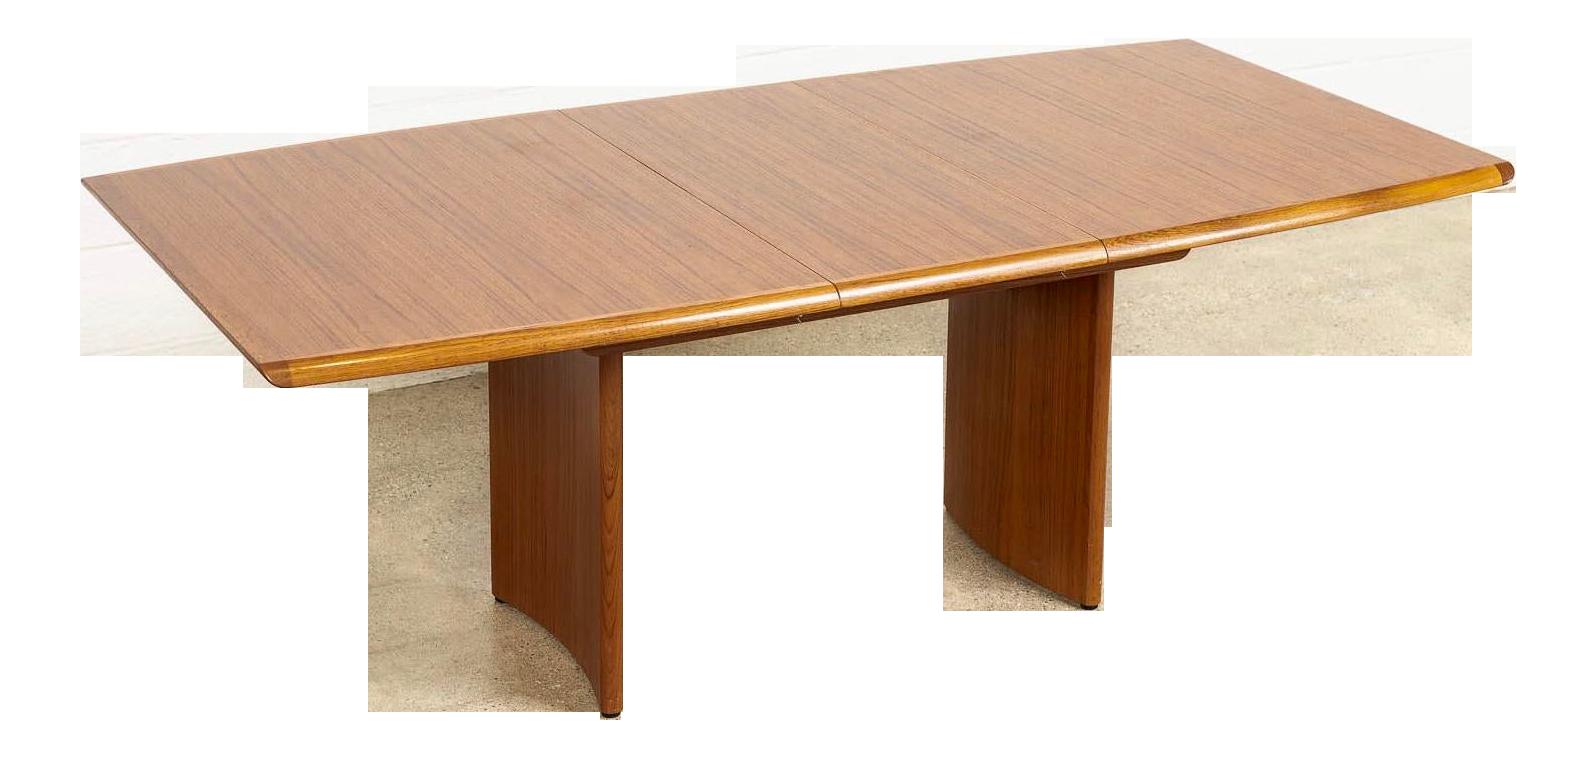 Vintage Mid Century Danish Modern Teak Wood Extendable Dining Table Chairish